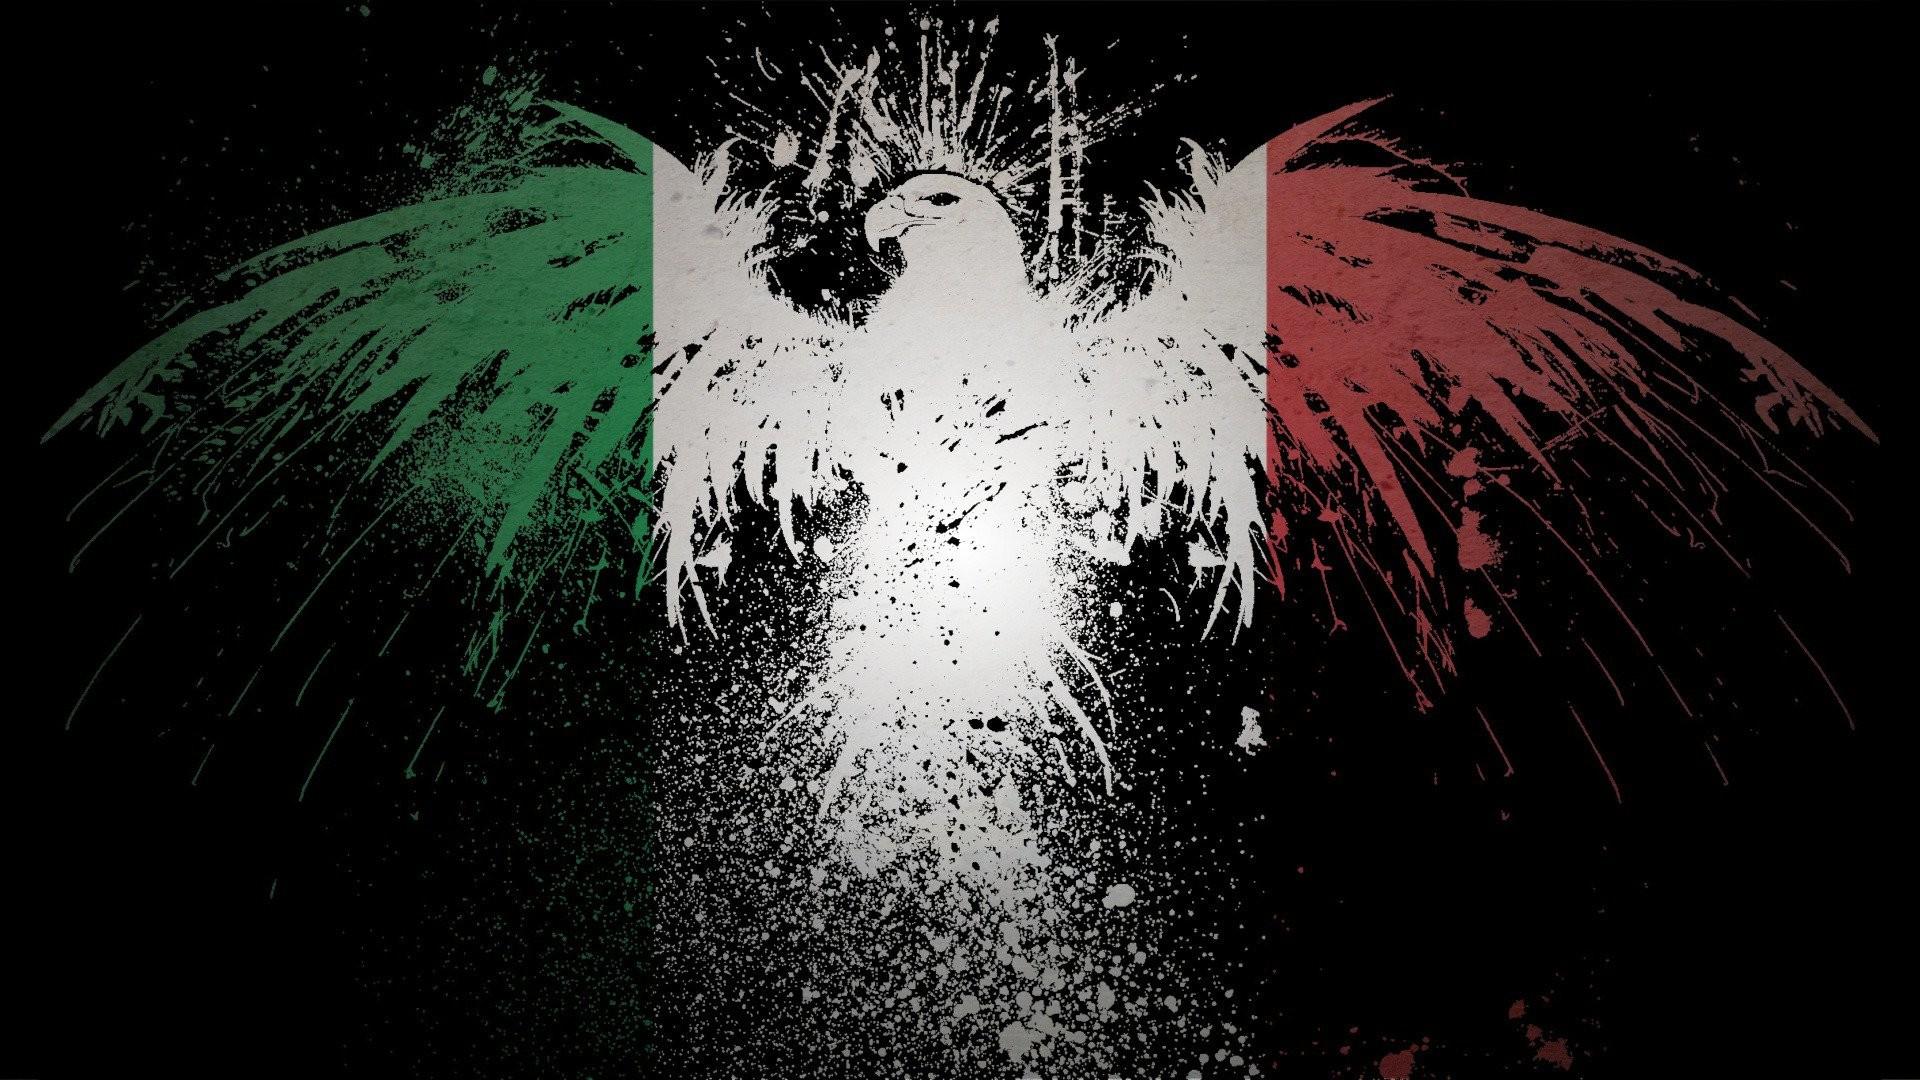 Italian Wallpaper 1400×1000 Italian Flag Images Wallpapers (27 Wallpapers)    Adorable Wallpapers   Desktop   Pinterest   Italian flag image and  Wallpaper